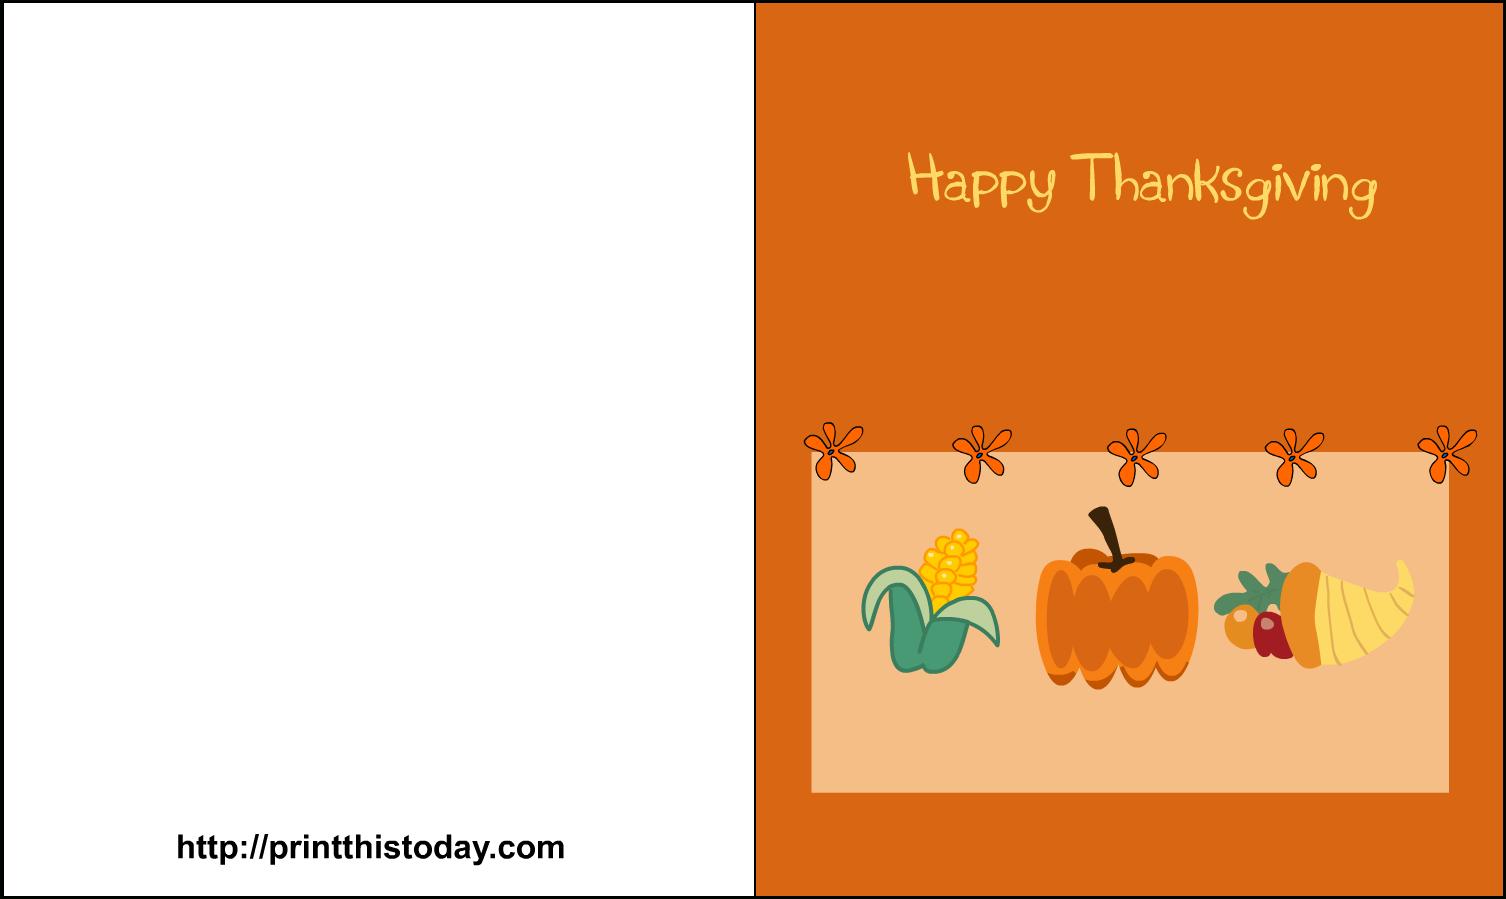 Download Premium Printable Thanksgiving Note Cards 25 Free Seasonal - Happy Thanksgiving Cards Free Printable